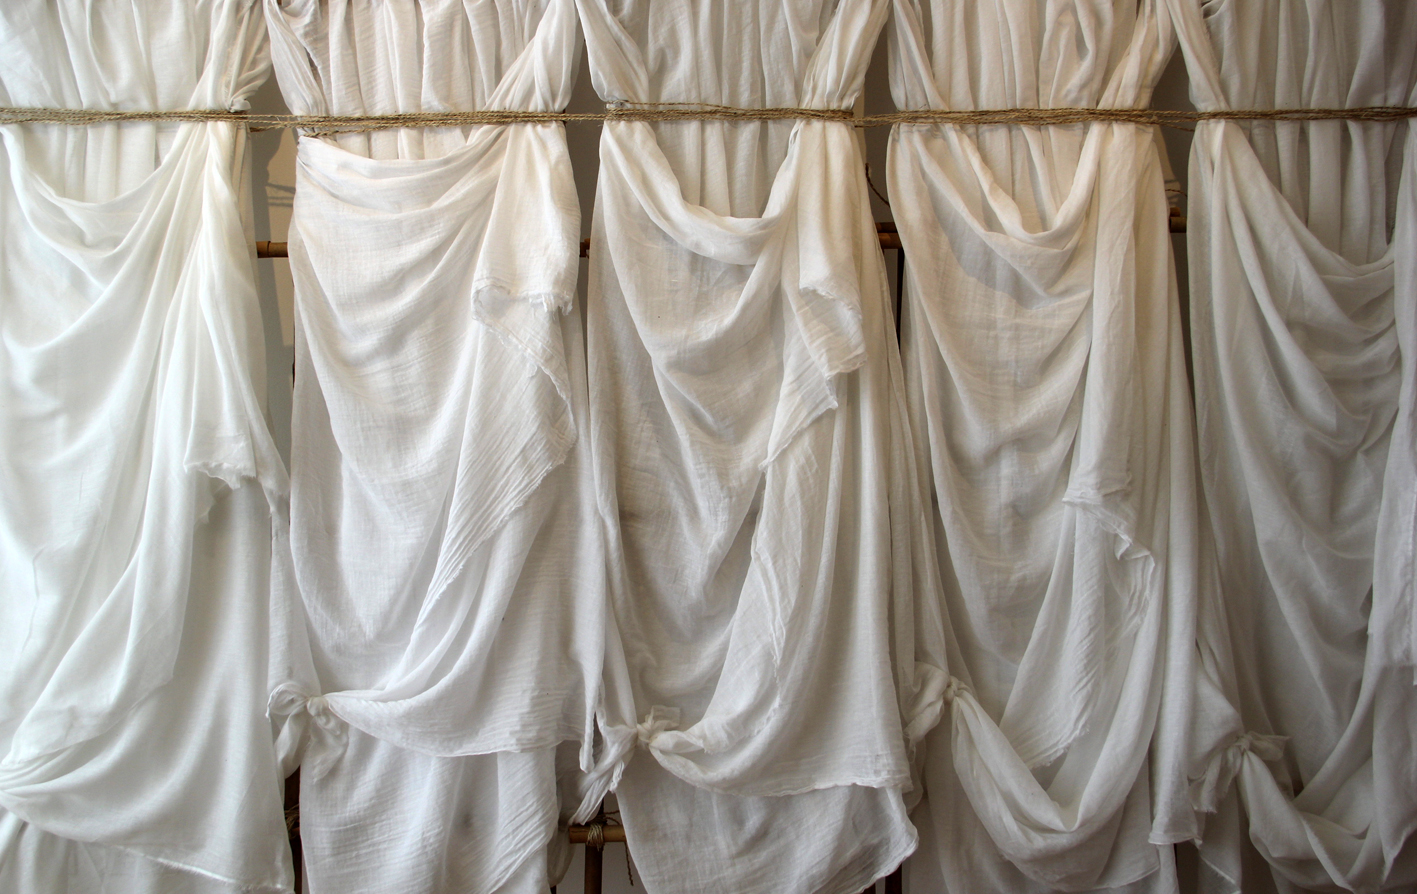 Elizabeth Wallace, 'Together Alone' (Detail), 2016 <br> muslin, bamboo, twine, 180 cm x 230 cm